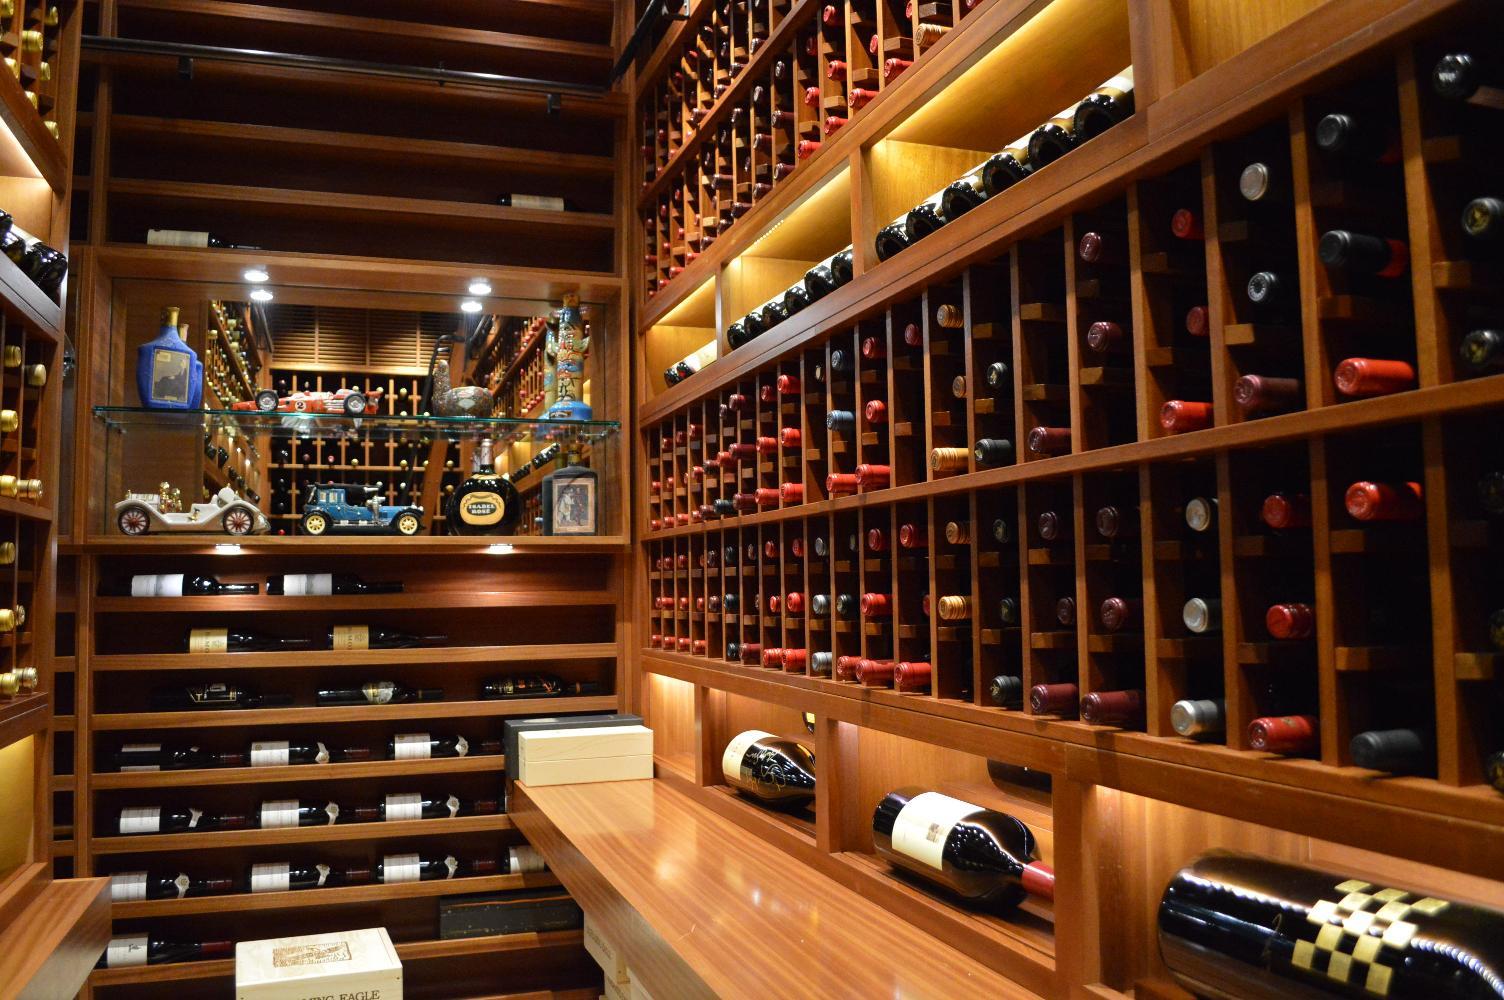 Miami Home Wine Cellar Project By Vintage Cellars - Home wine cellar design